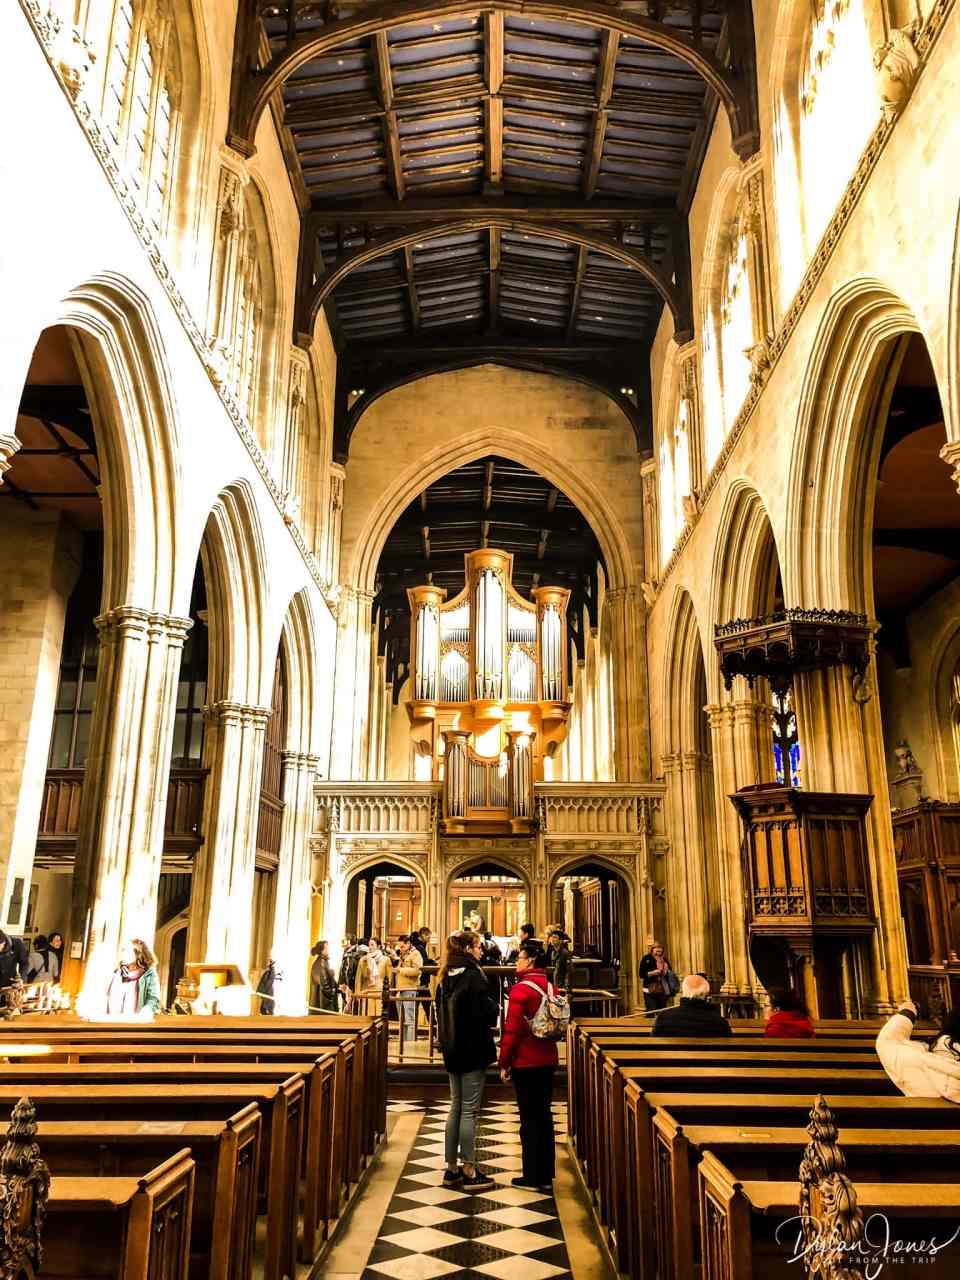 University Church of St. Mary the Virgin interior